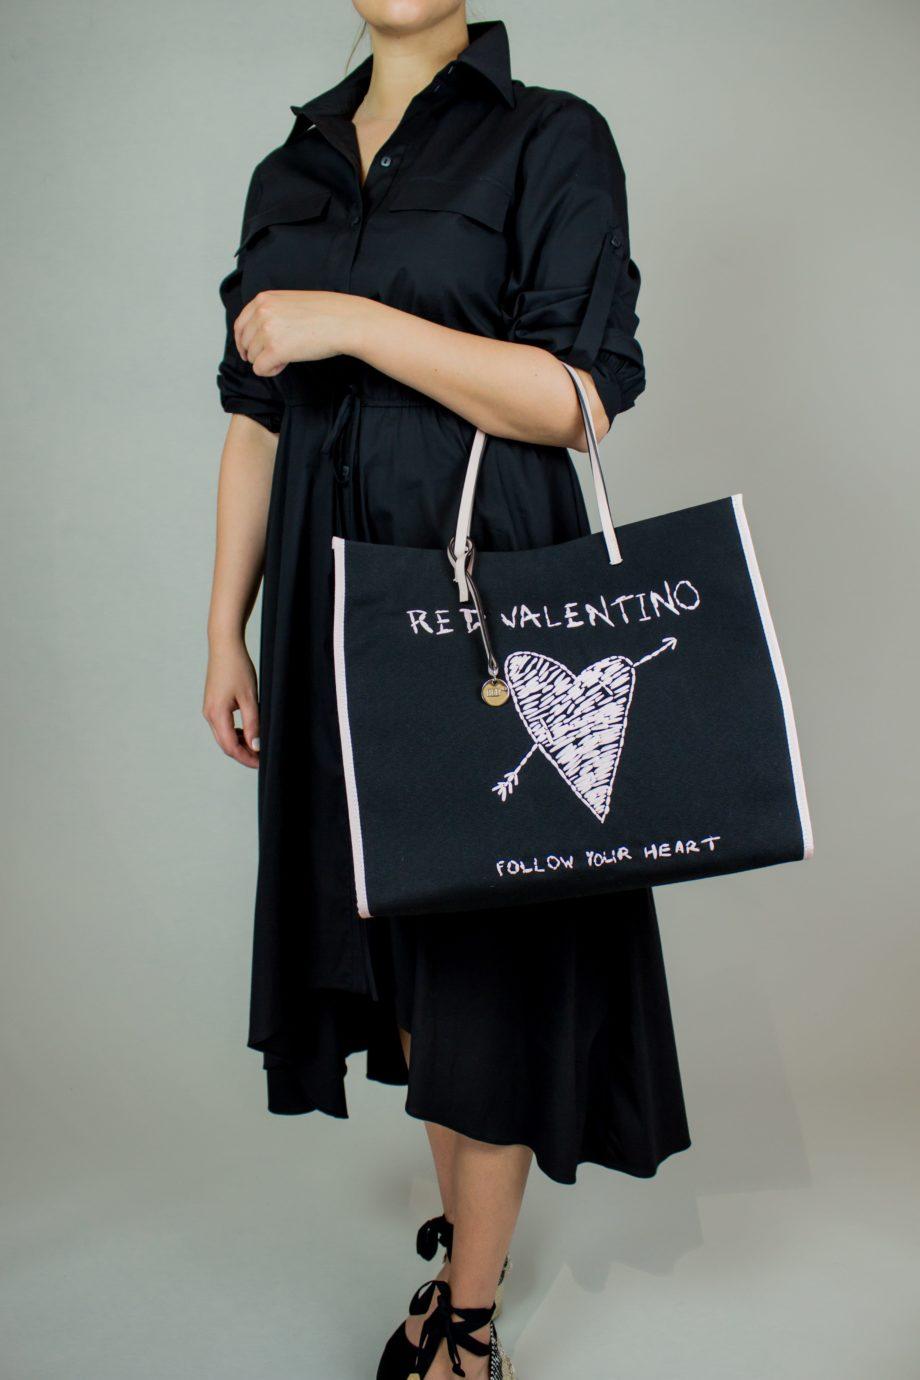 7. KRISTINA TI Black cotton dress